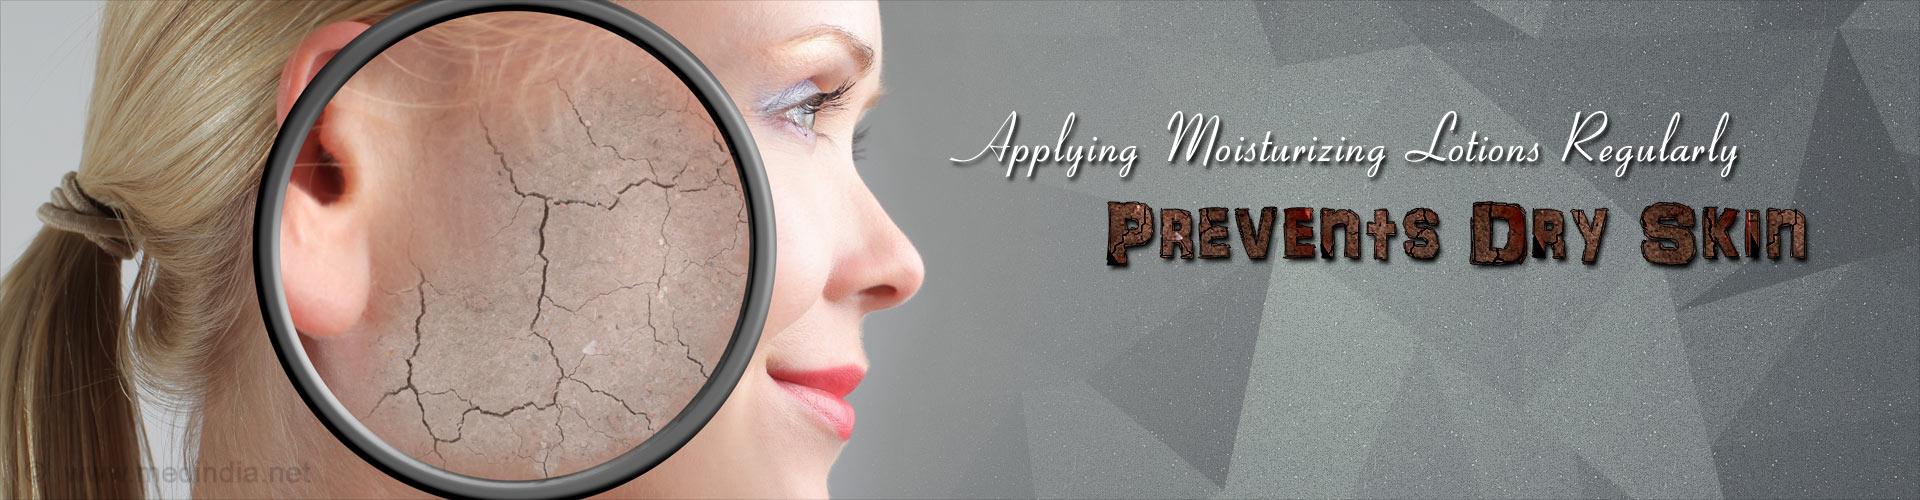 Applying moisturizing lotions regularly prevents dry skin